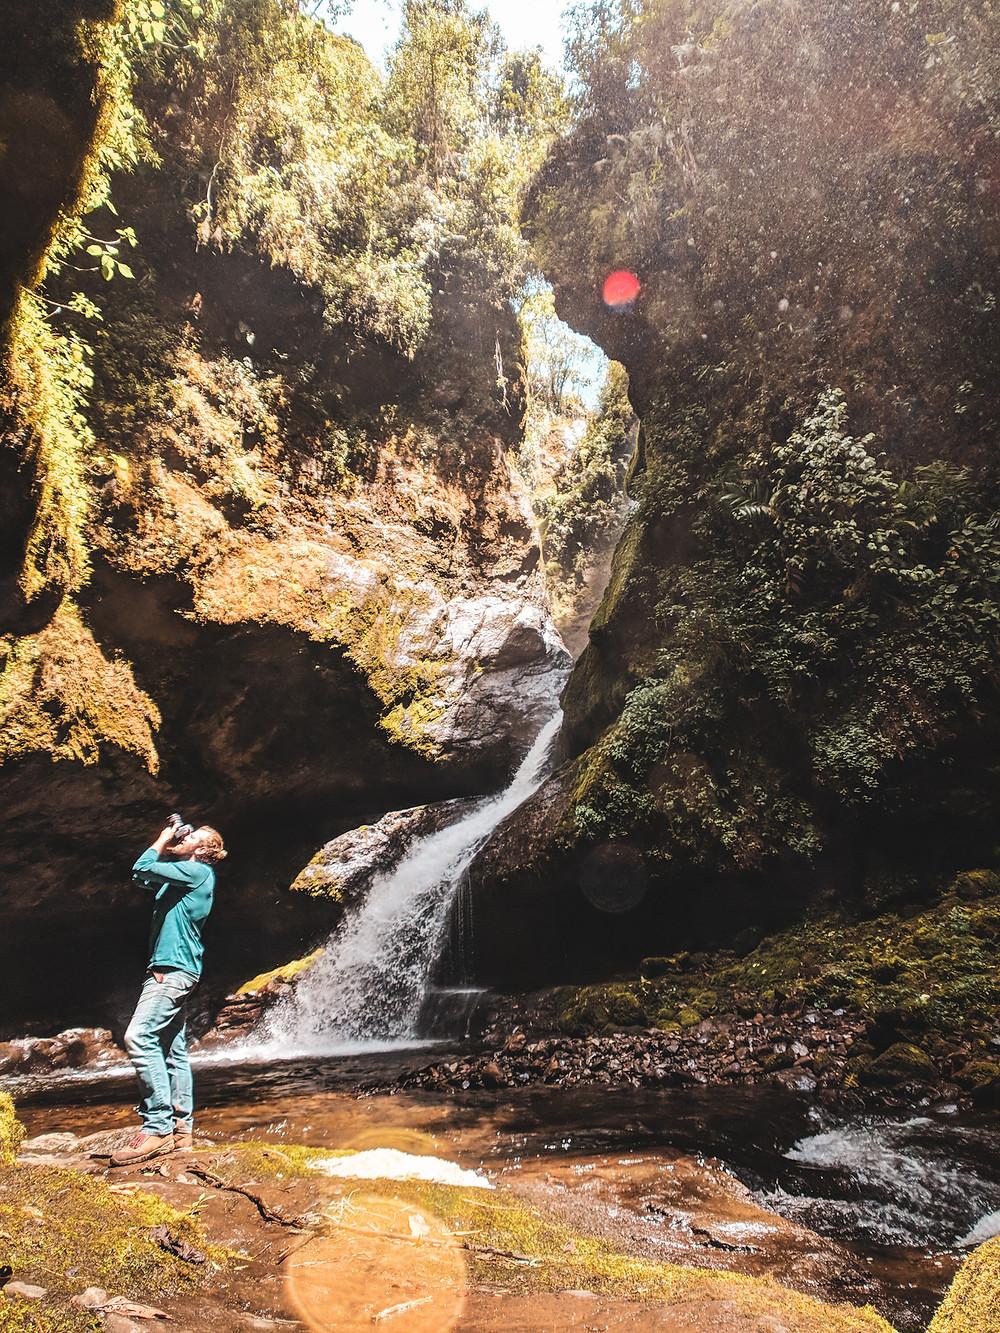 Taking photos of waterfalls in Jardin, Colombia.